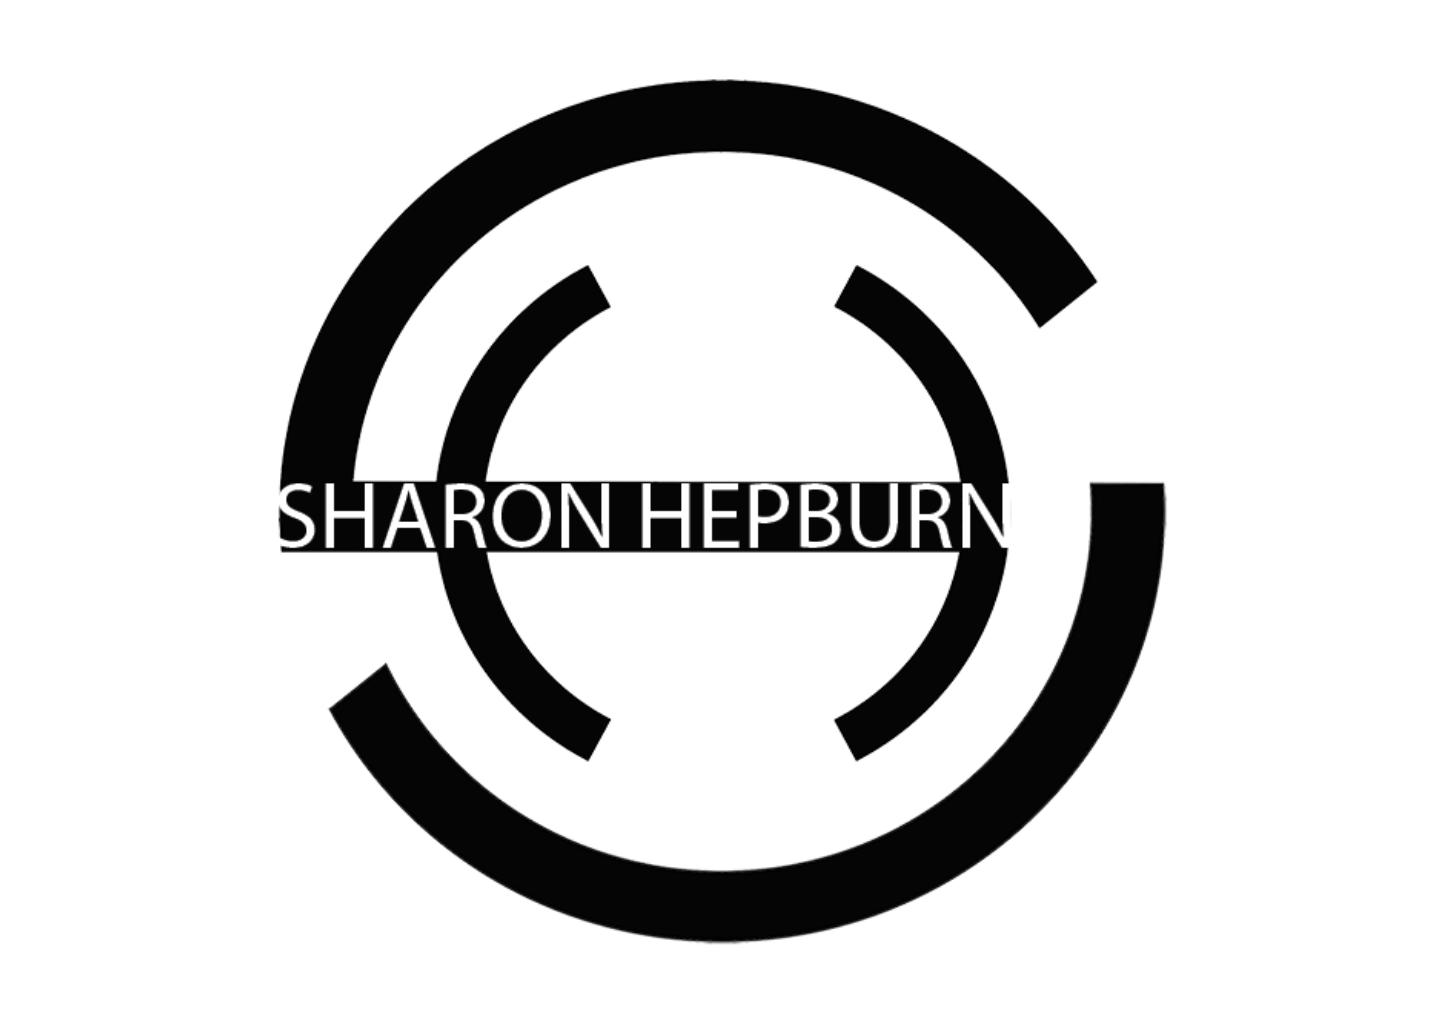 Sharon Hepburn